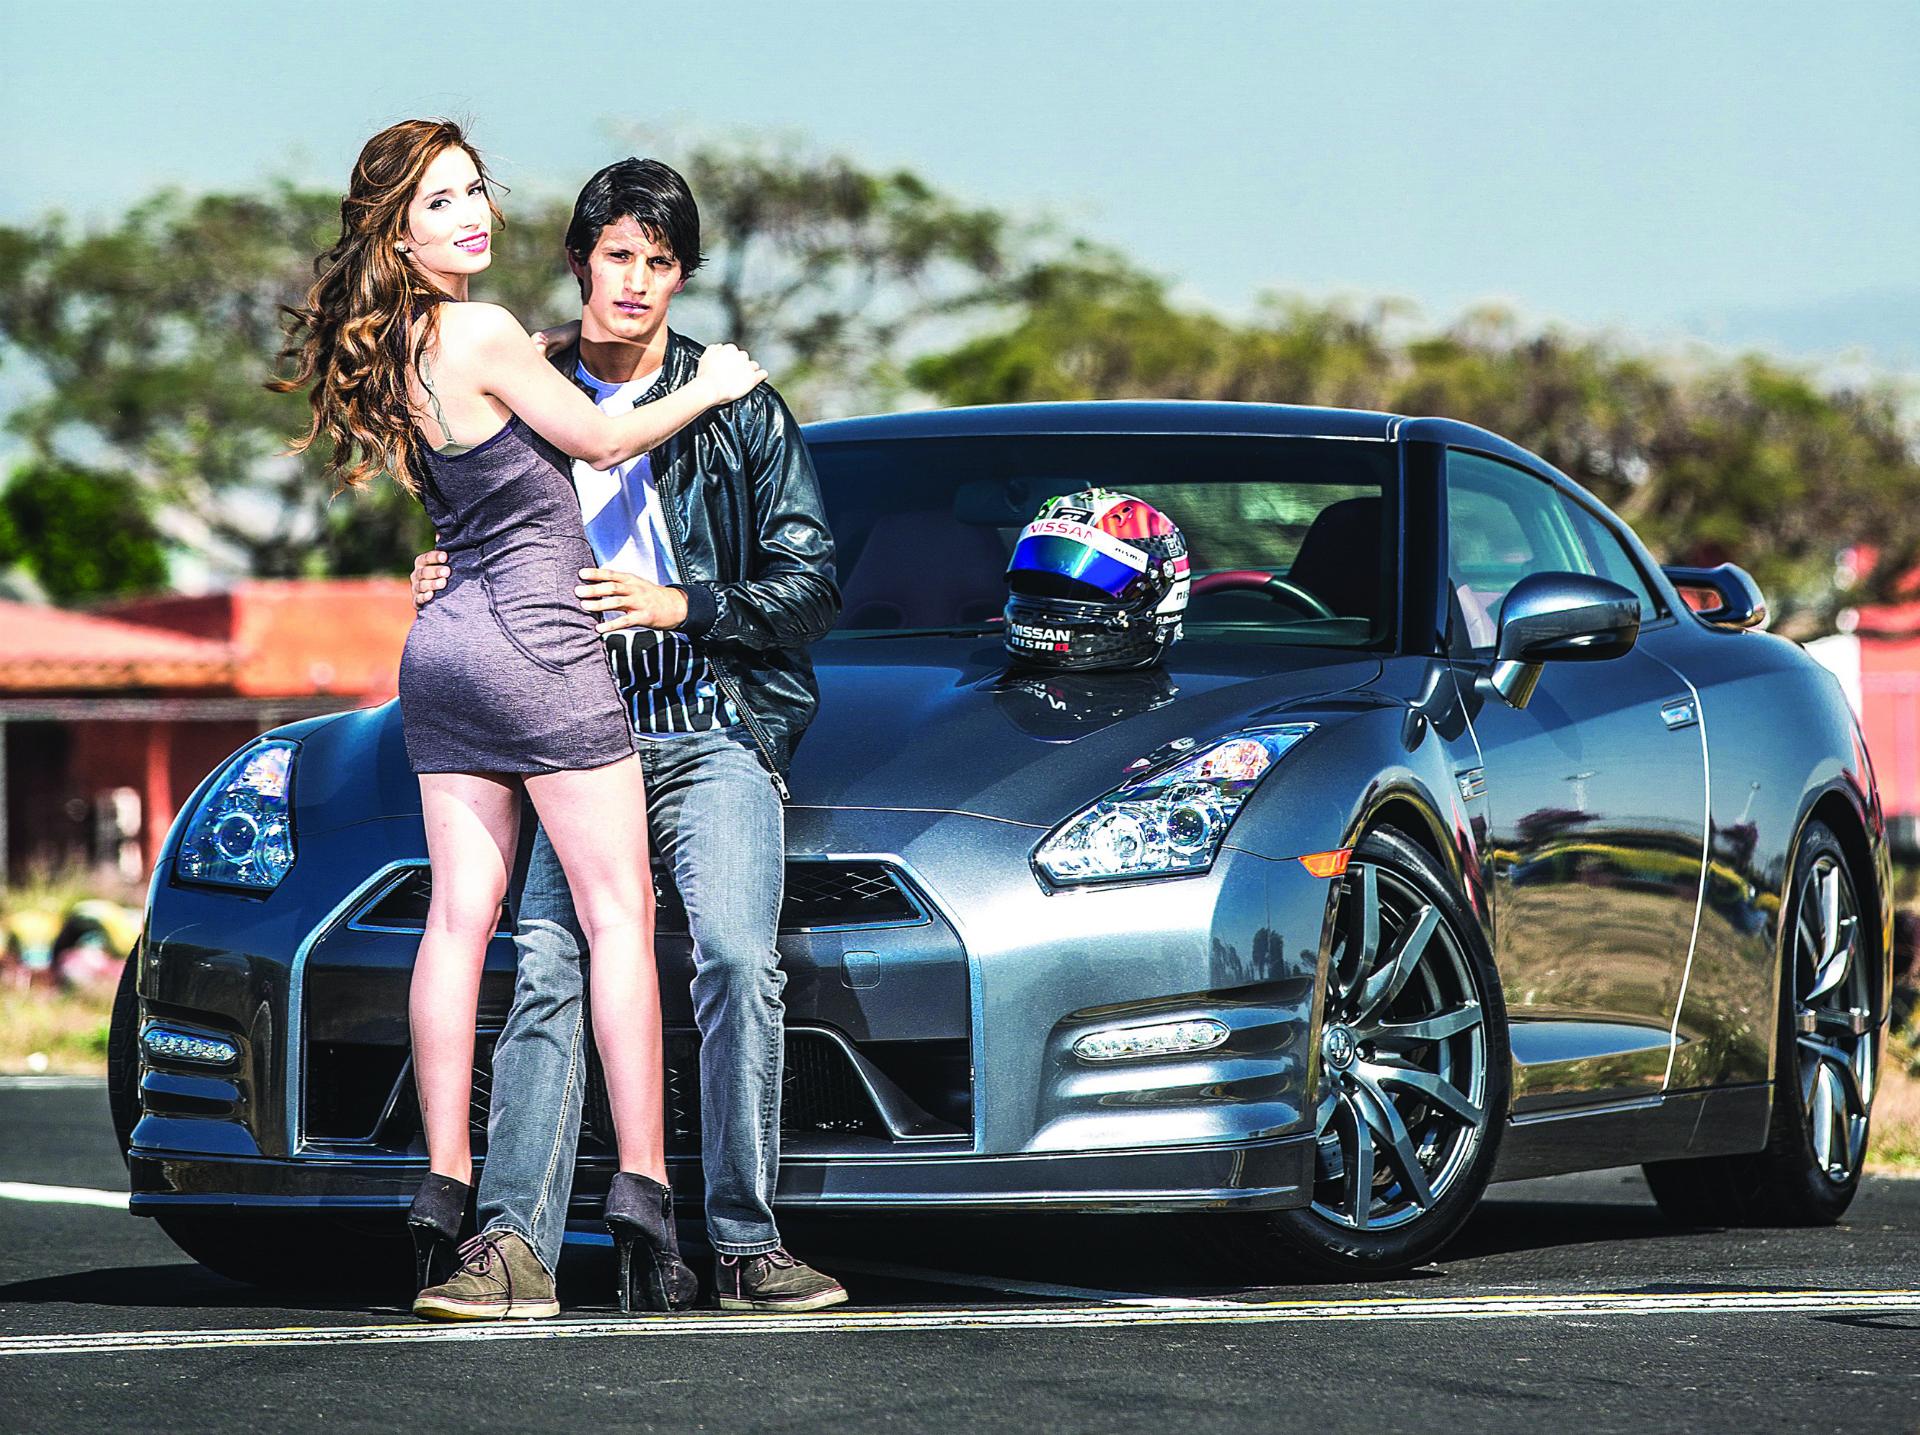 Nissan Sentra 2014 >> Nissan GT-R 2015 en México Catalogo | Atraccion360